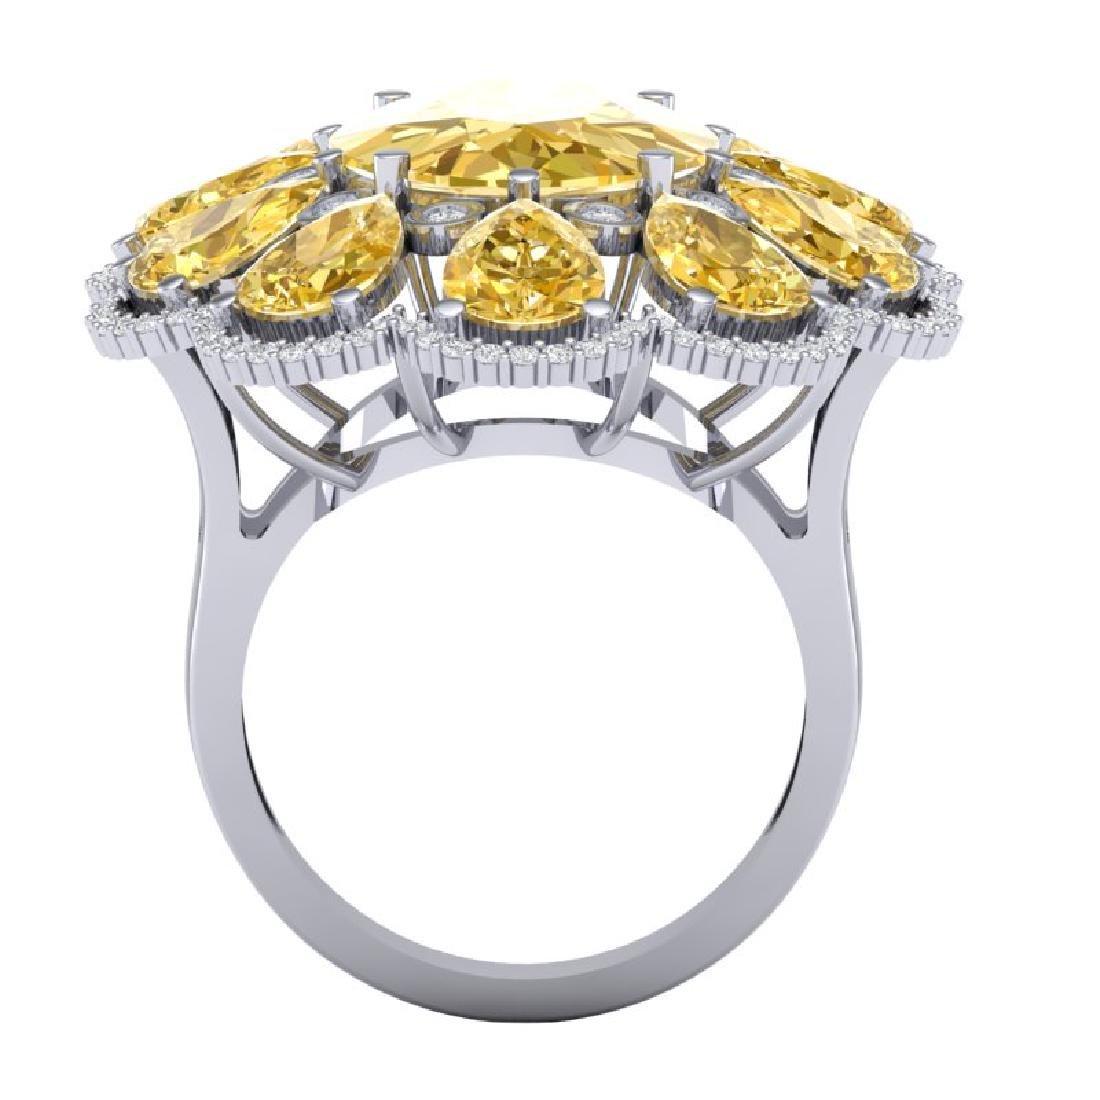 18.53 CTW Royalty Canary Citrine & VS Diamond Ring 18K - 3